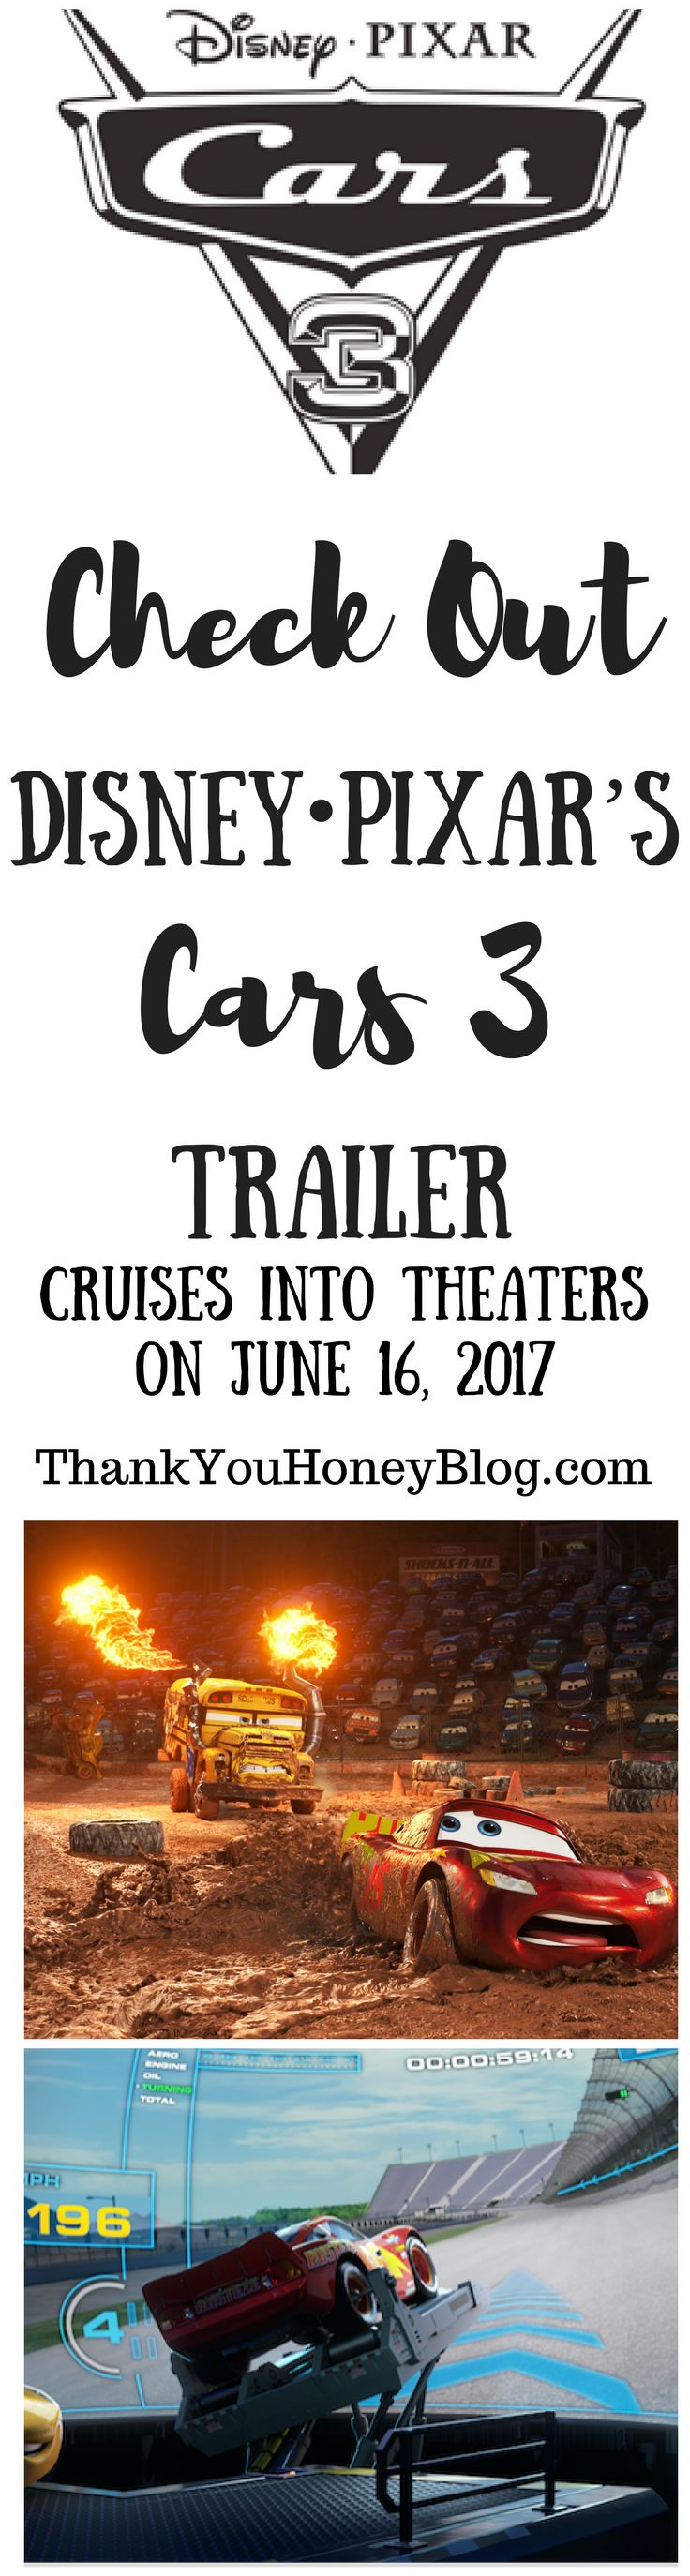 Check out the CARS 3 Trailer, 2017, Cars 3, Coming Soon, Disney•Pixar, Disney•Pixar`s Cars 3, Film, movies, Theaters June 16 2017, Check Out the CARS 3 Trailer, Summer Movies, Trailer